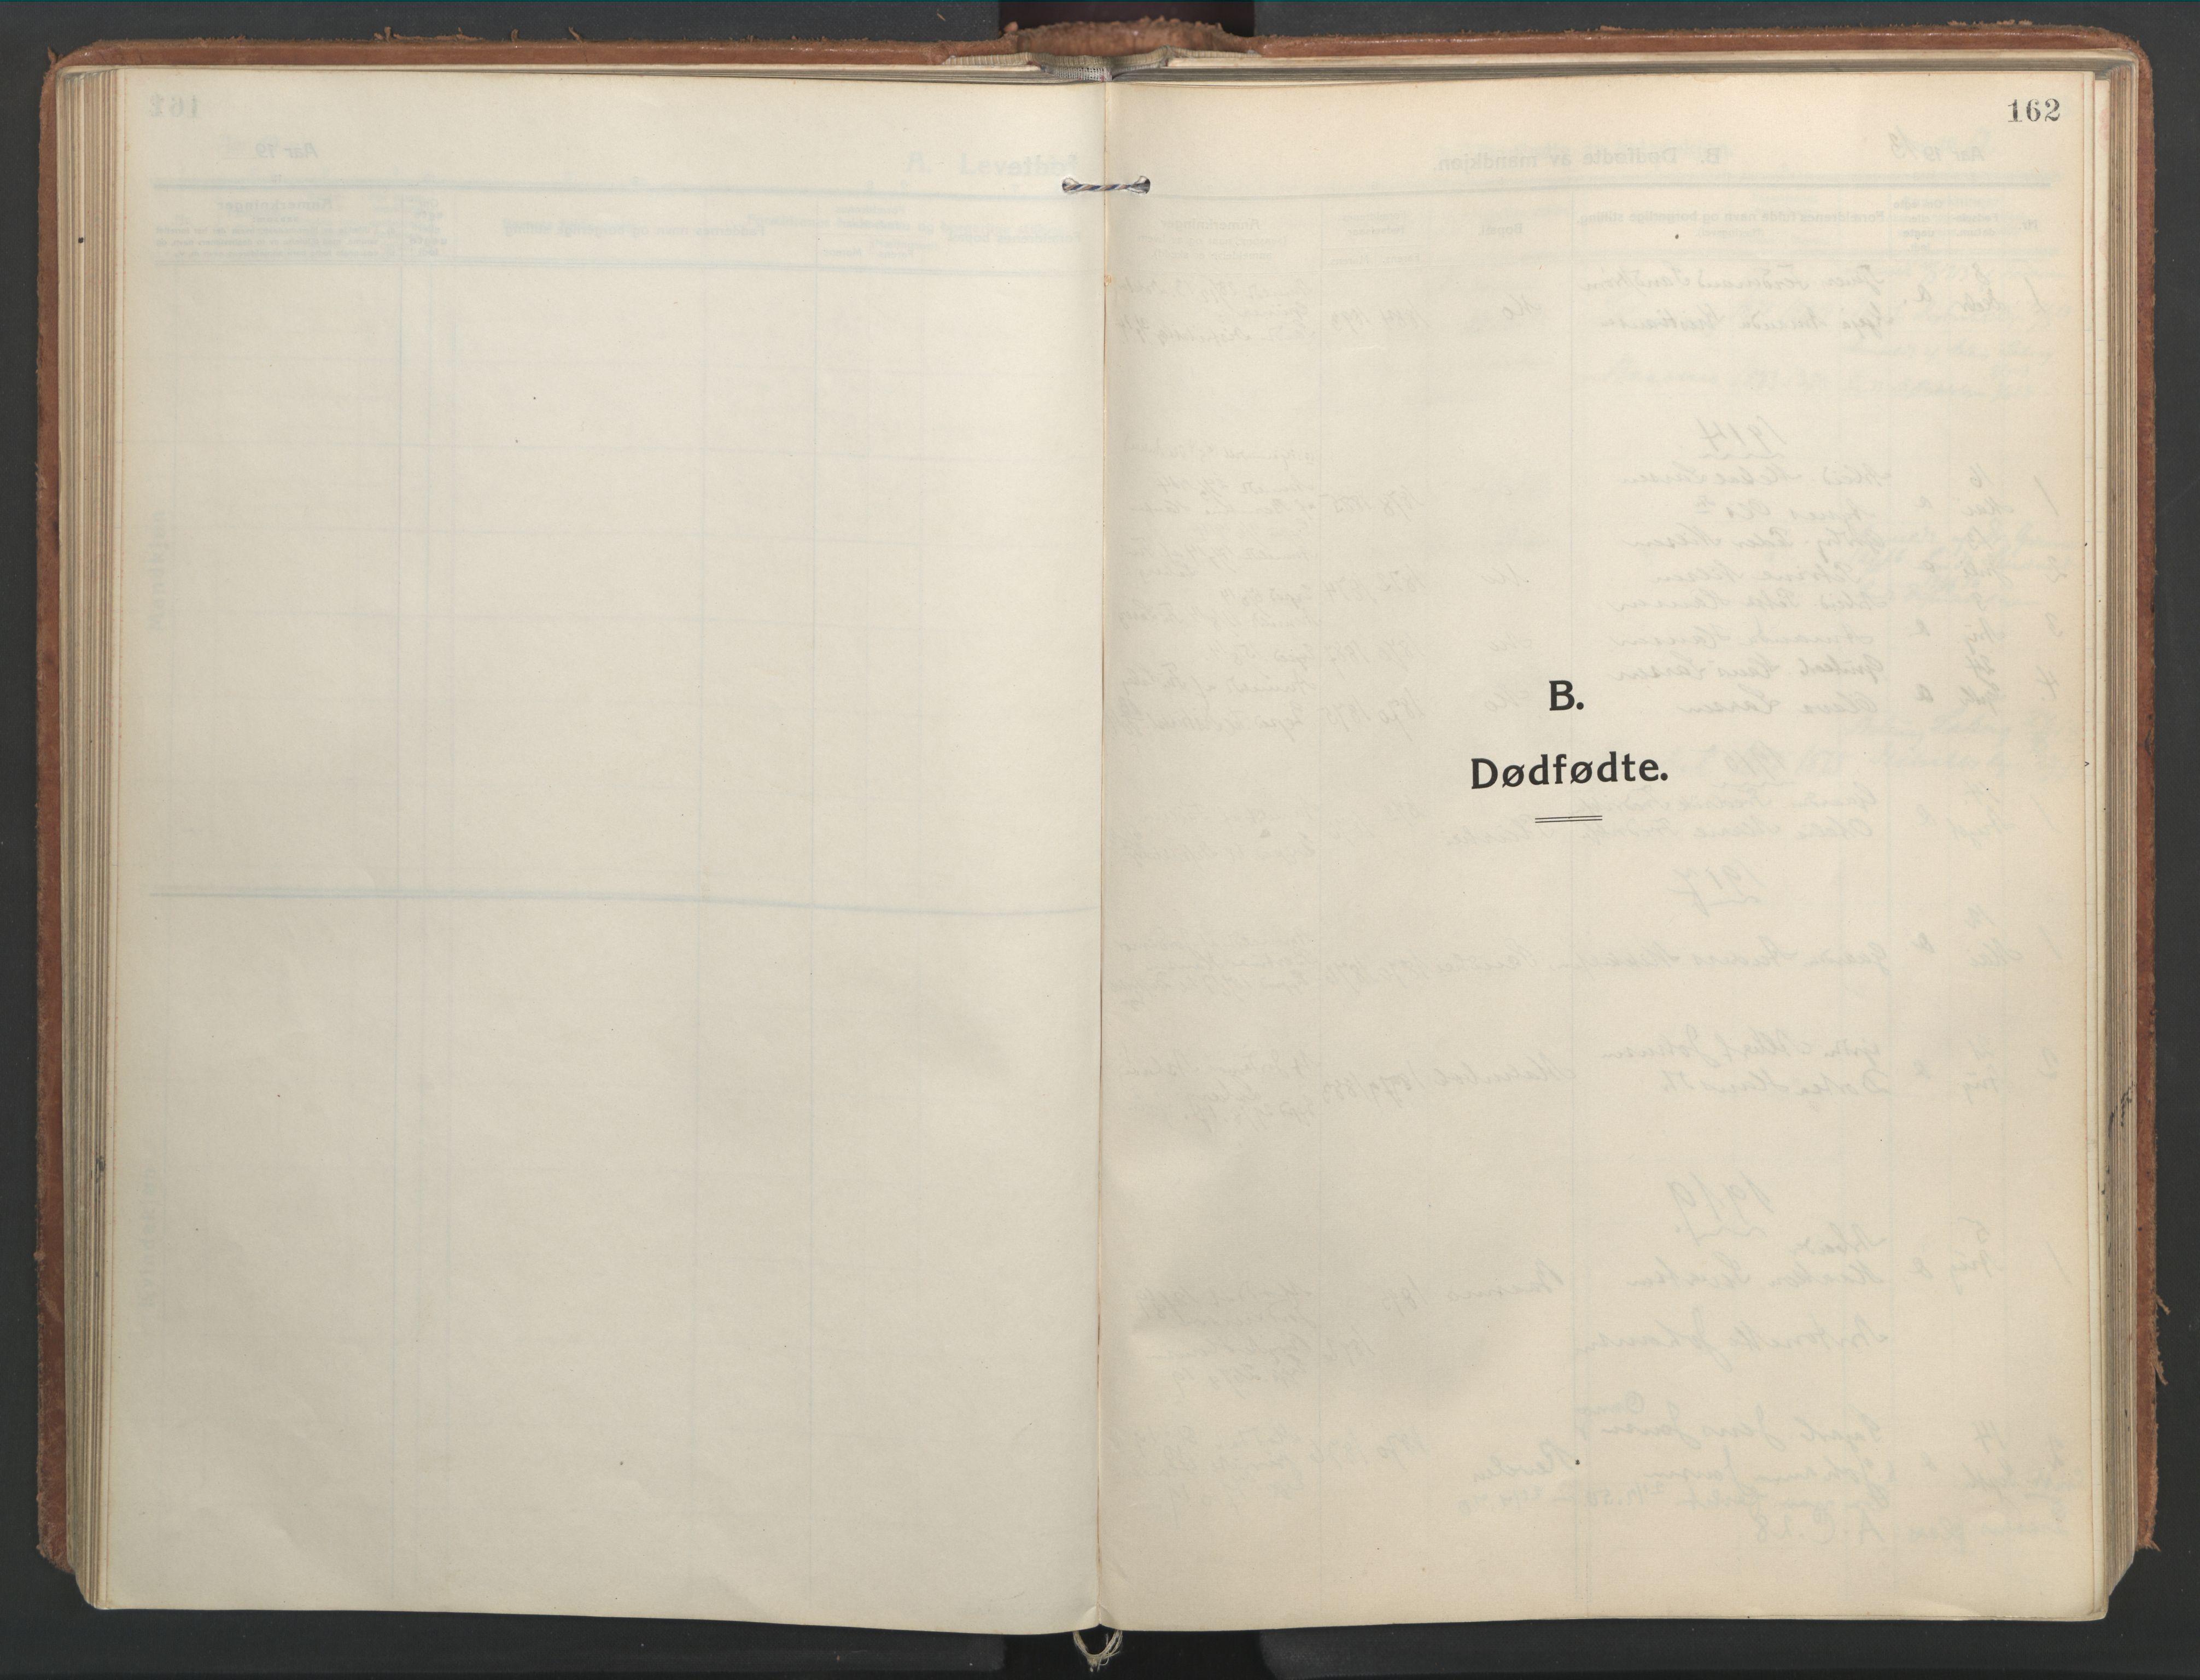 SAT, Ministerialprotokoller, klokkerbøker og fødselsregistre - Nordland, 827/L0404: Ministerialbok nr. 827A16, 1912-1925, s. 162